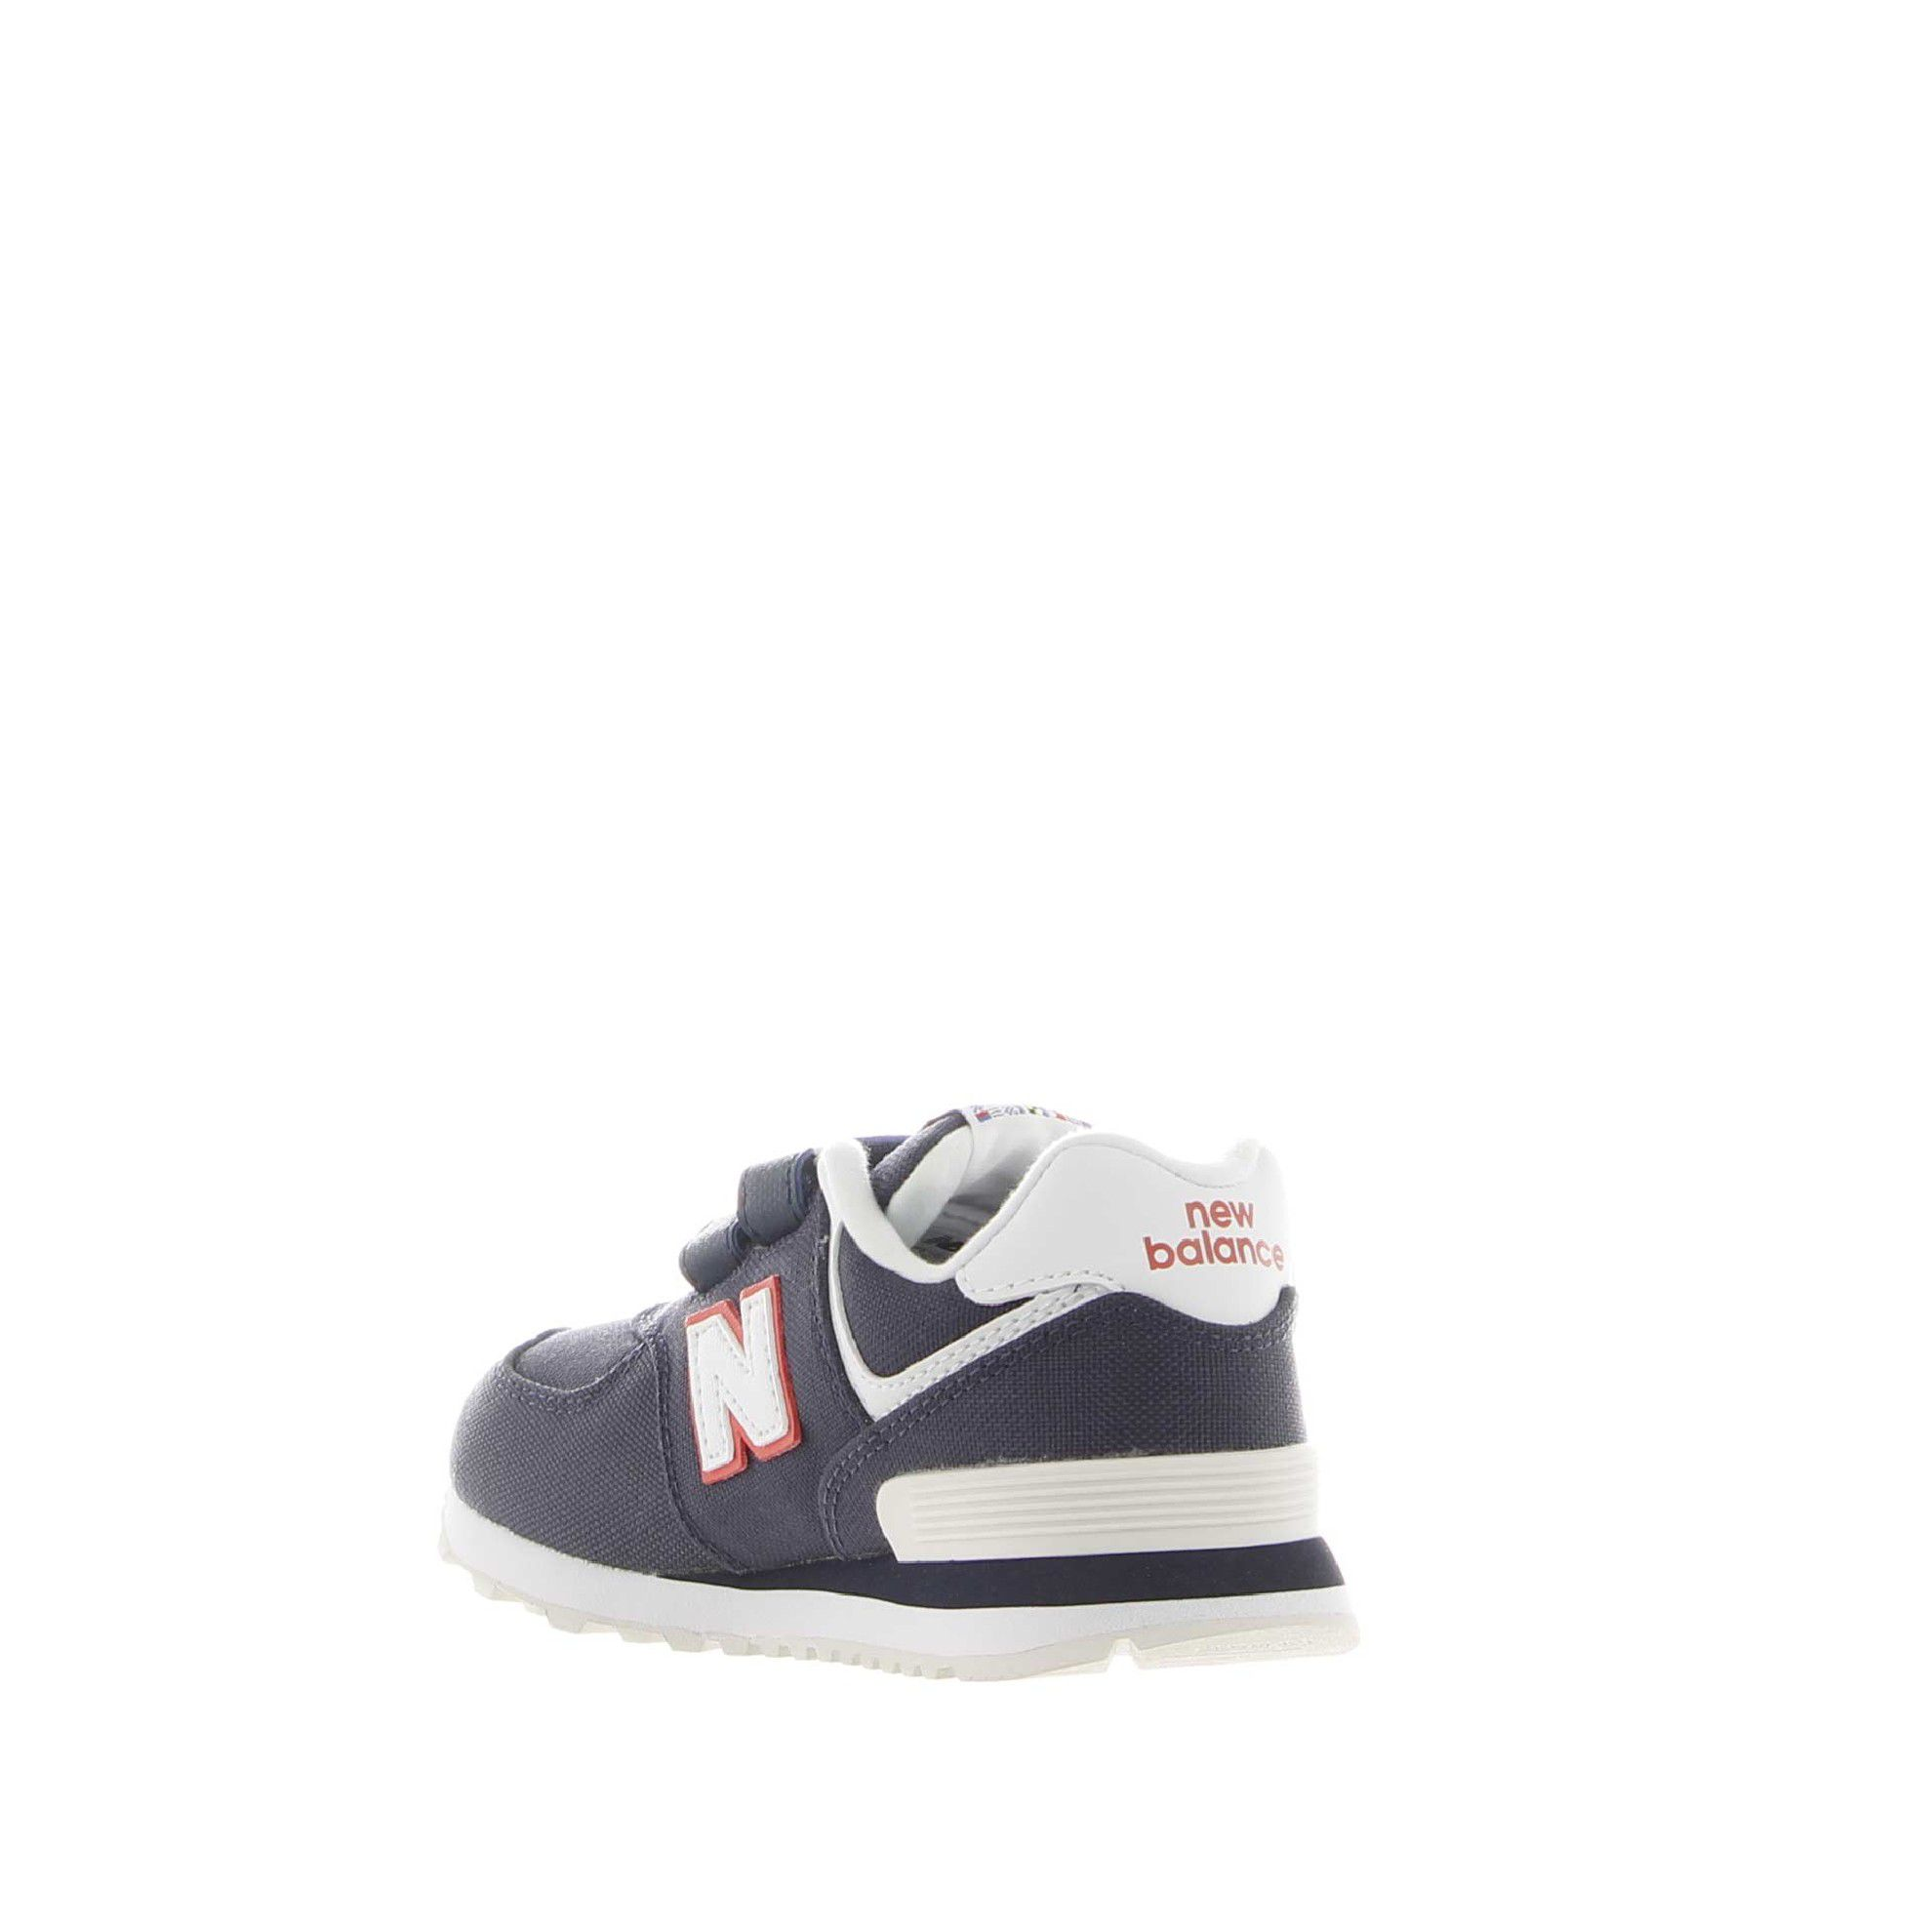 New balance sneaker 574 hook and loop in canvas da bambino